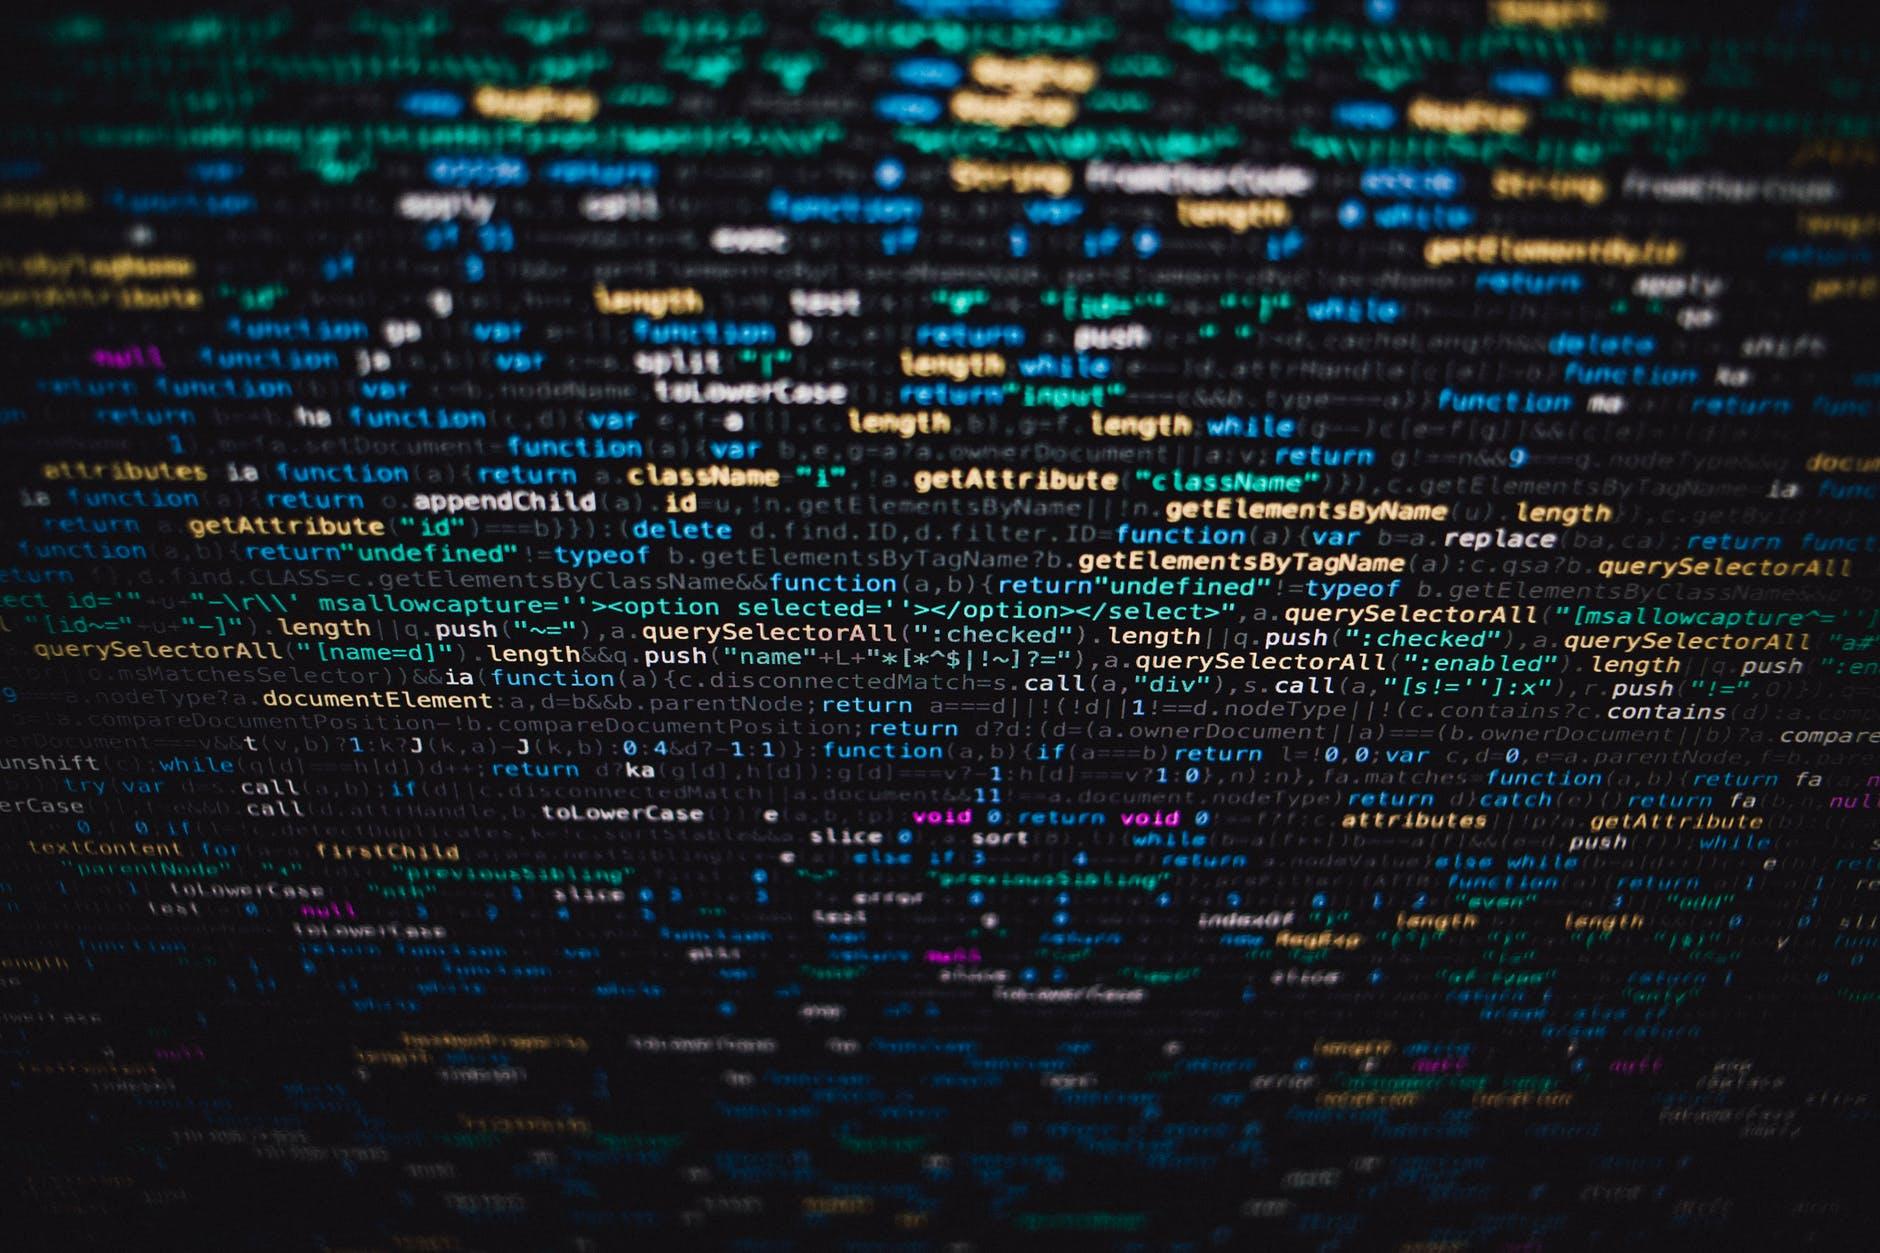 Top 10 Strategic Trends in Enterprise Software Development In 2020